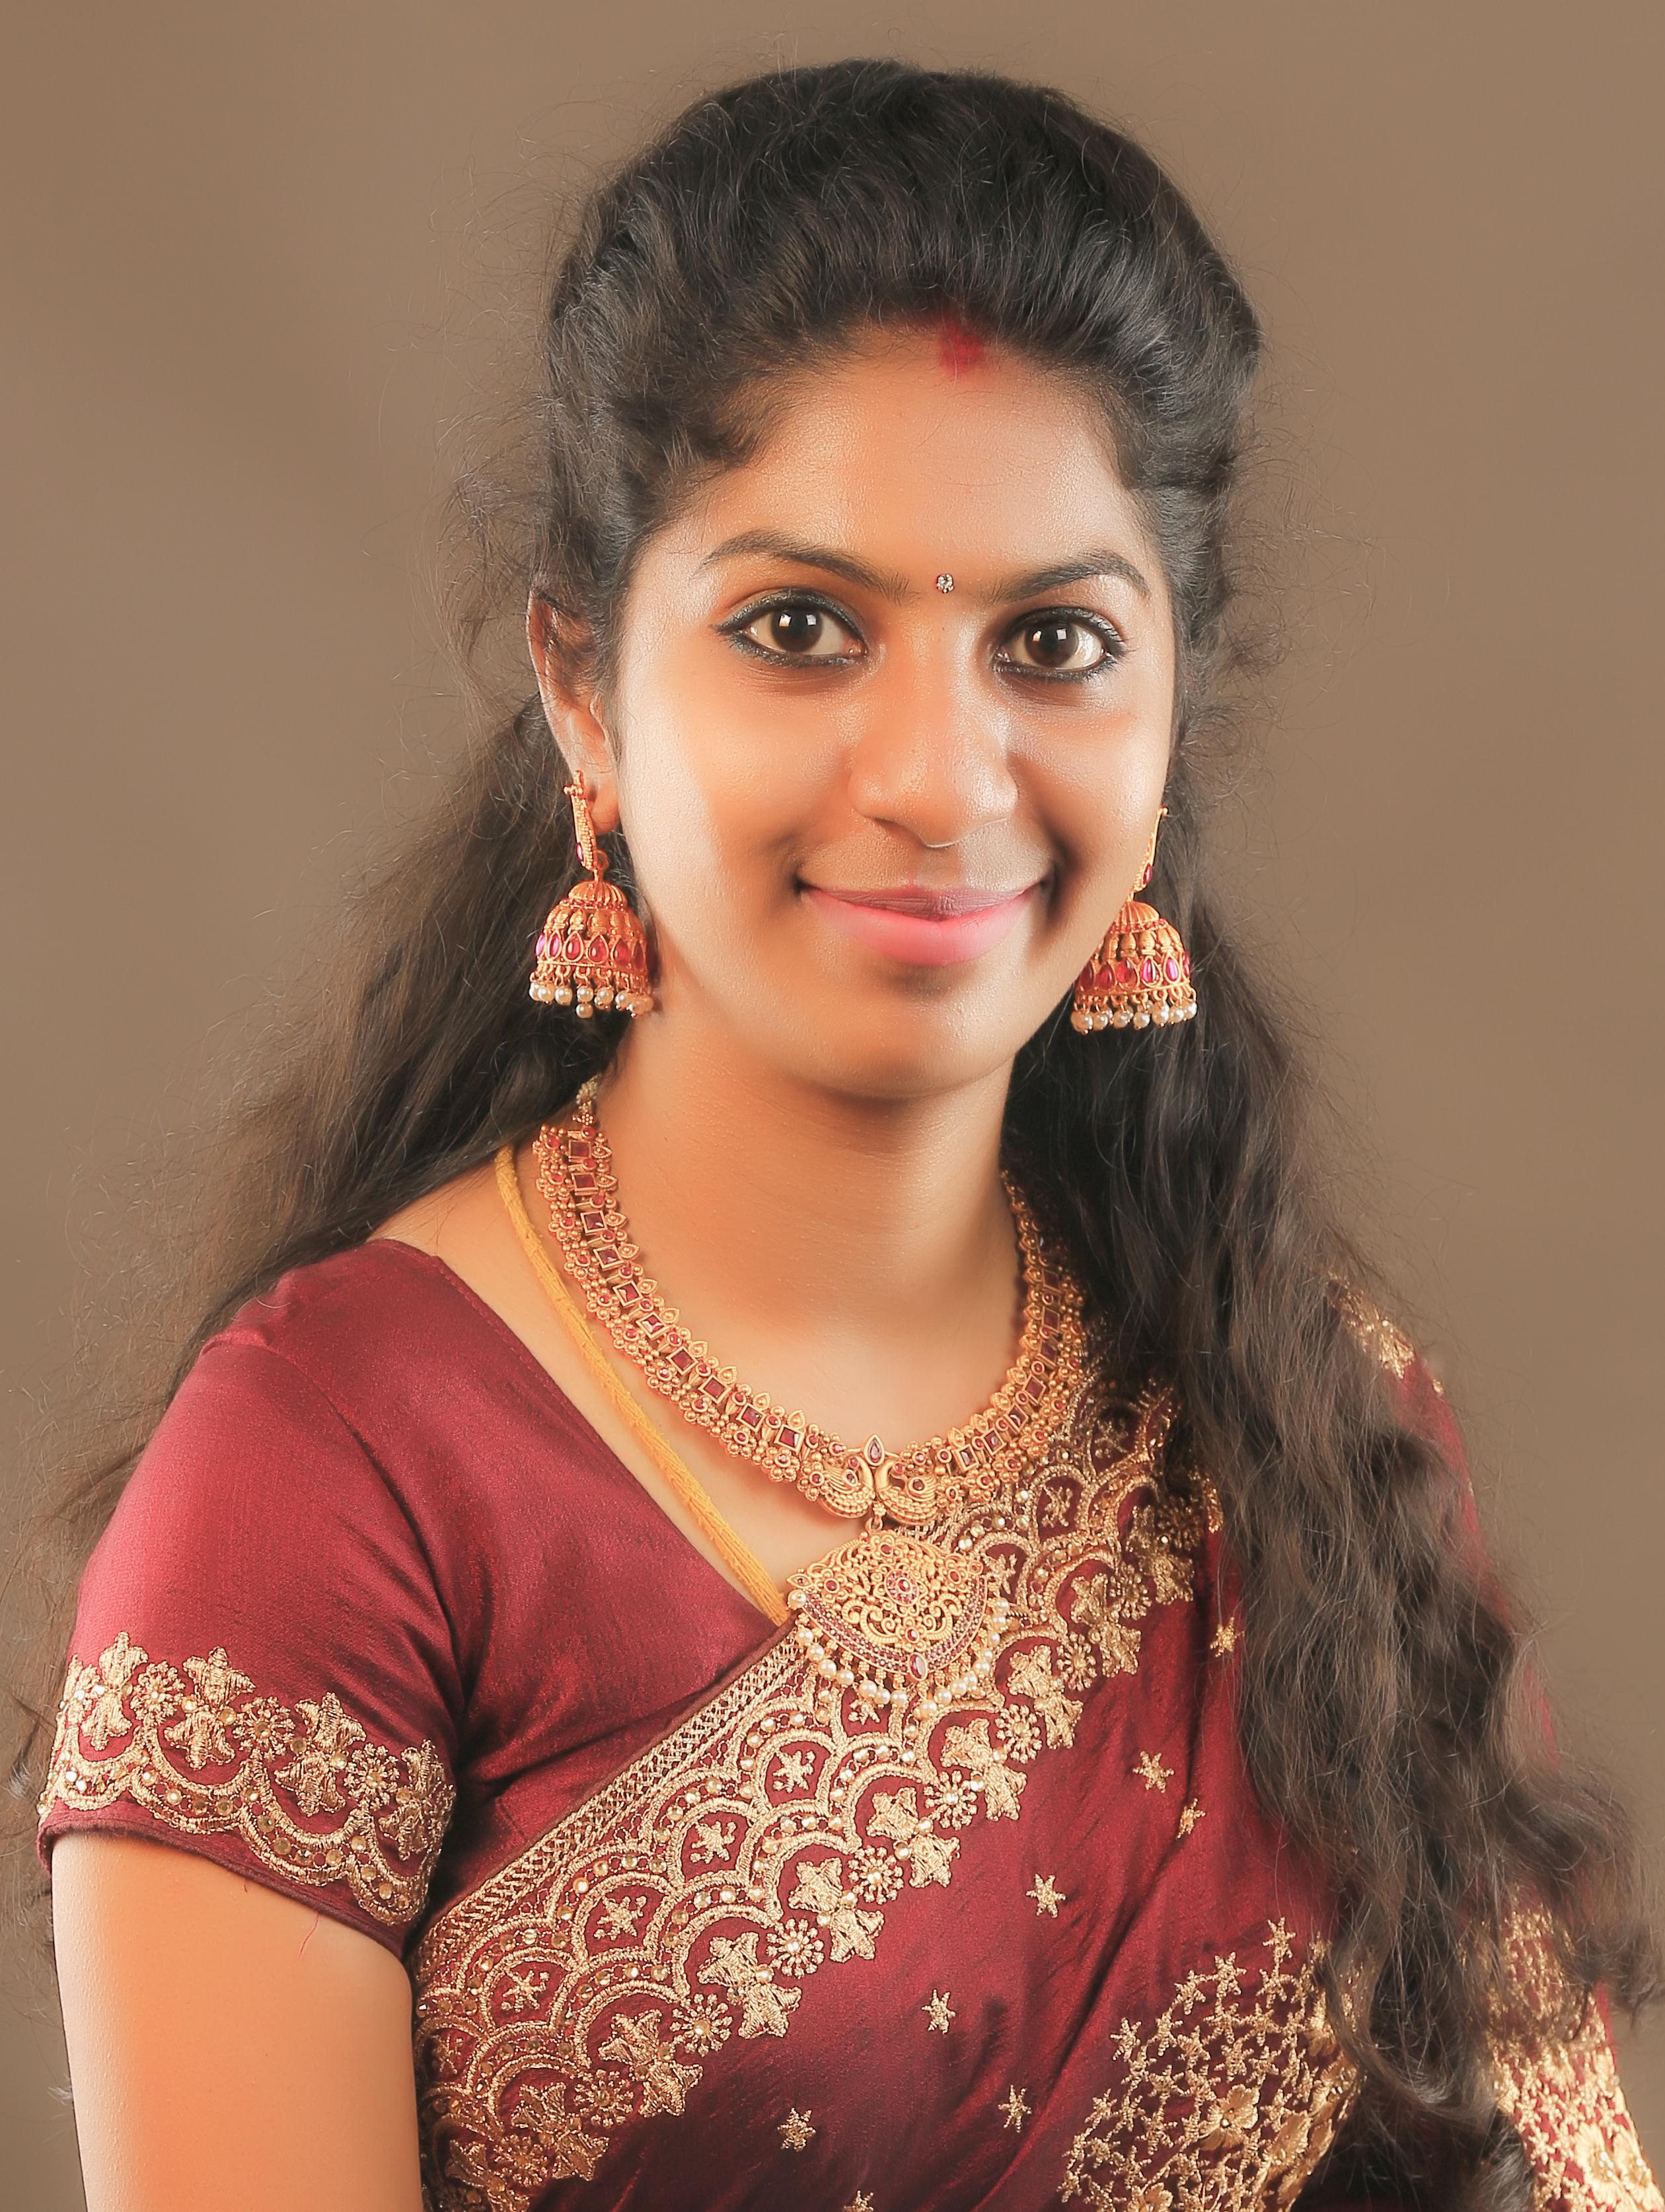 Ms. Sandheya